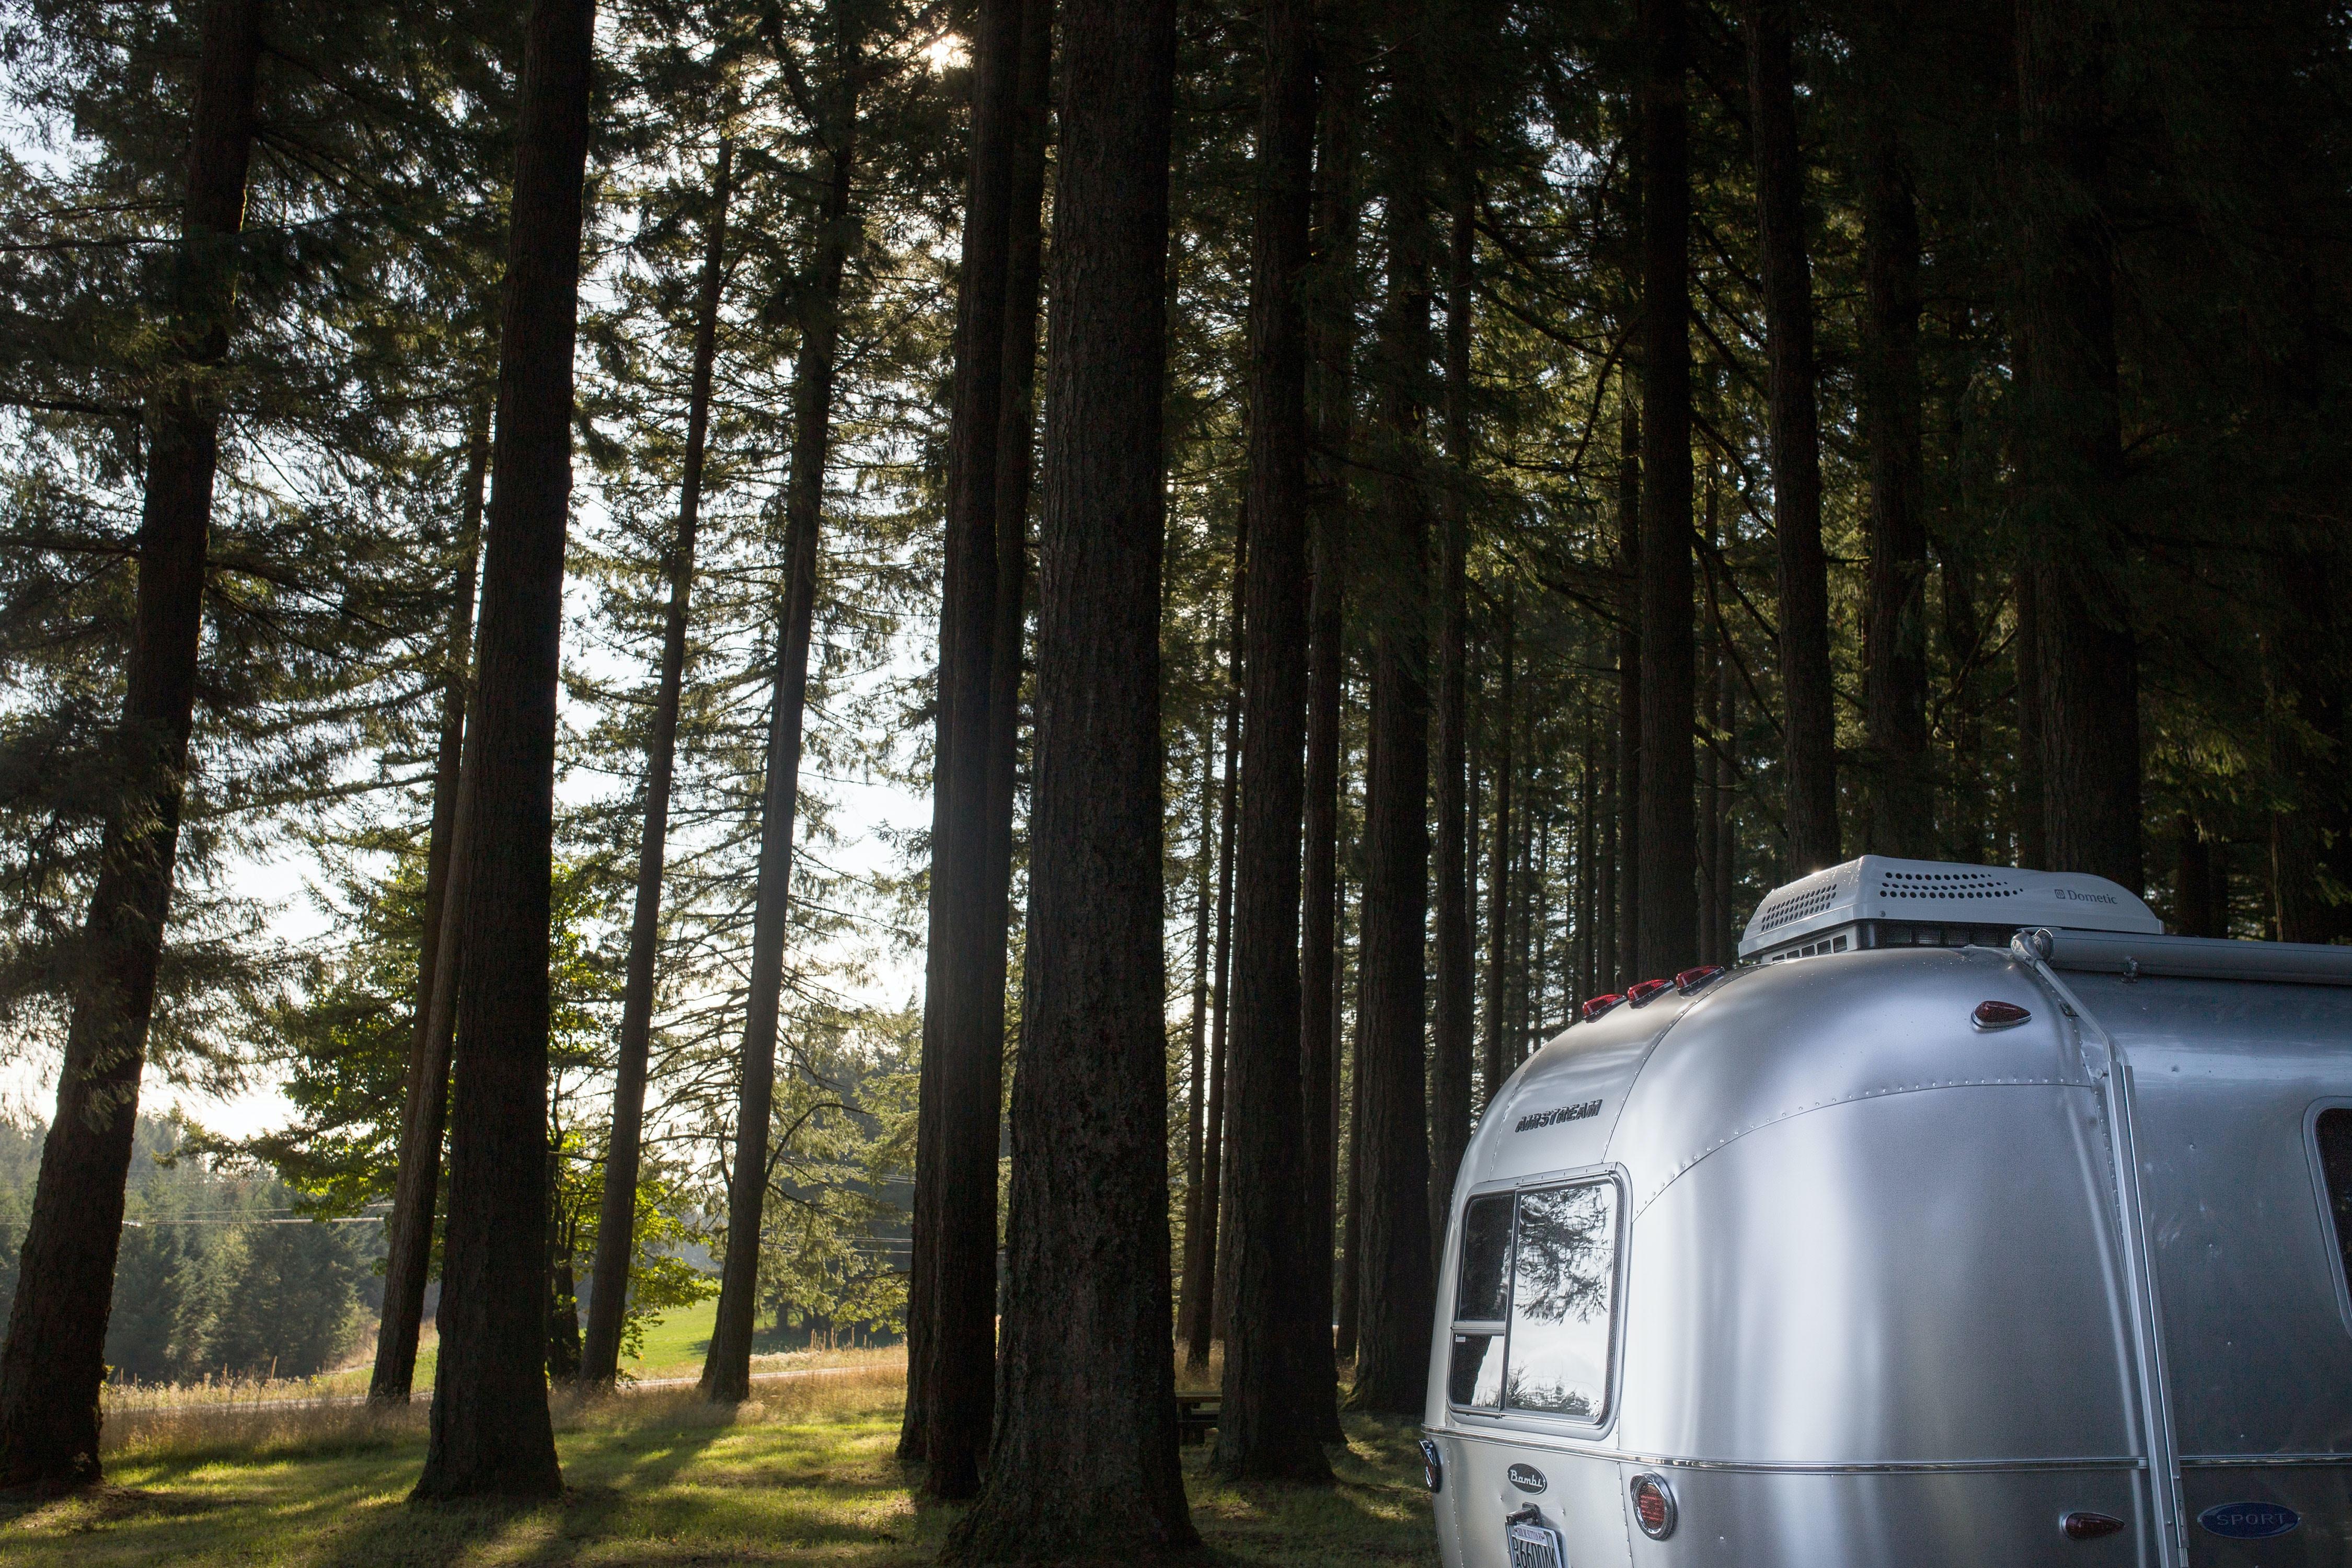 gray metal trailer beside green trees during daytime